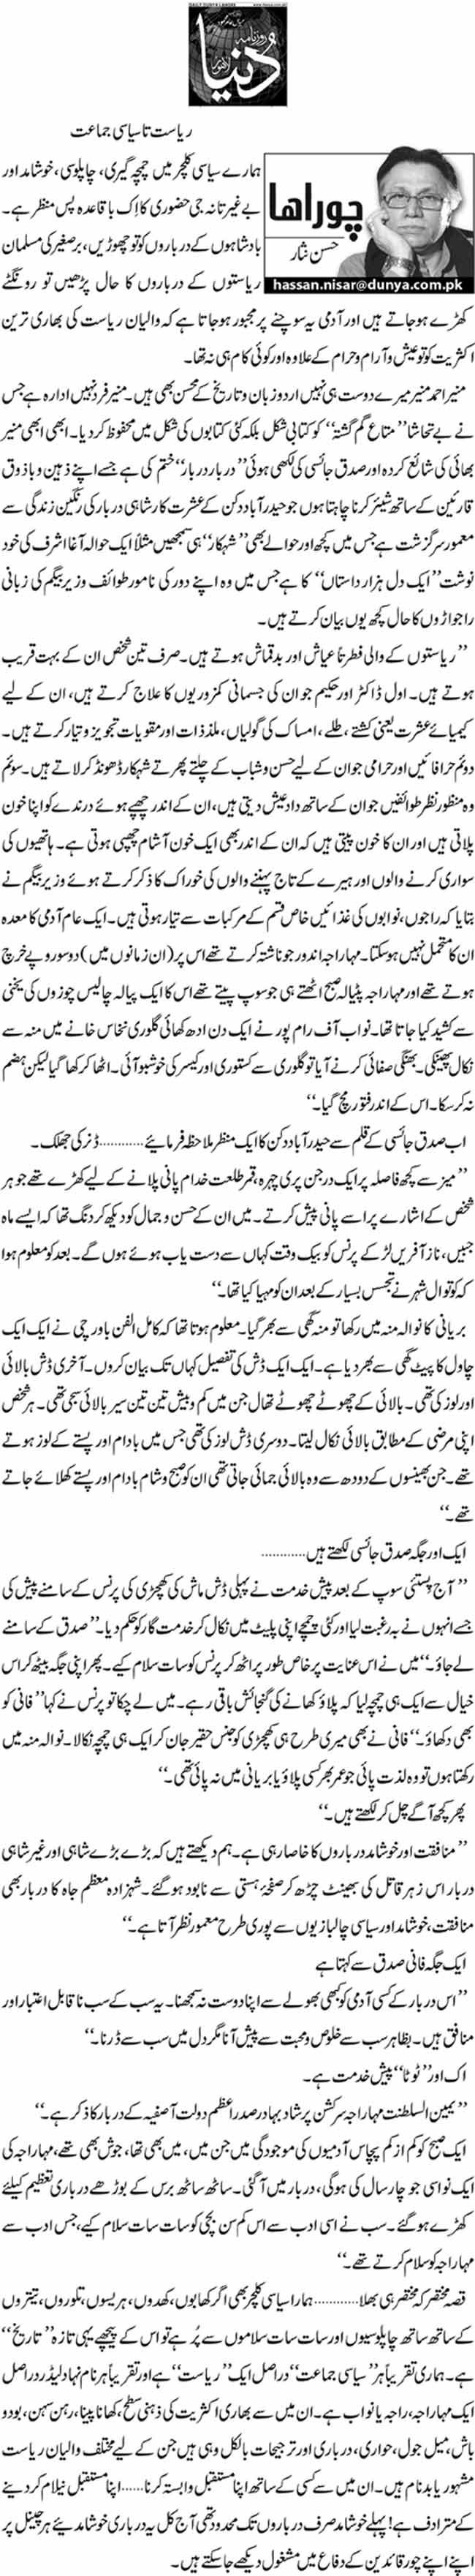 Riyyasat ta siyasi jamaat - Hassan Nisar